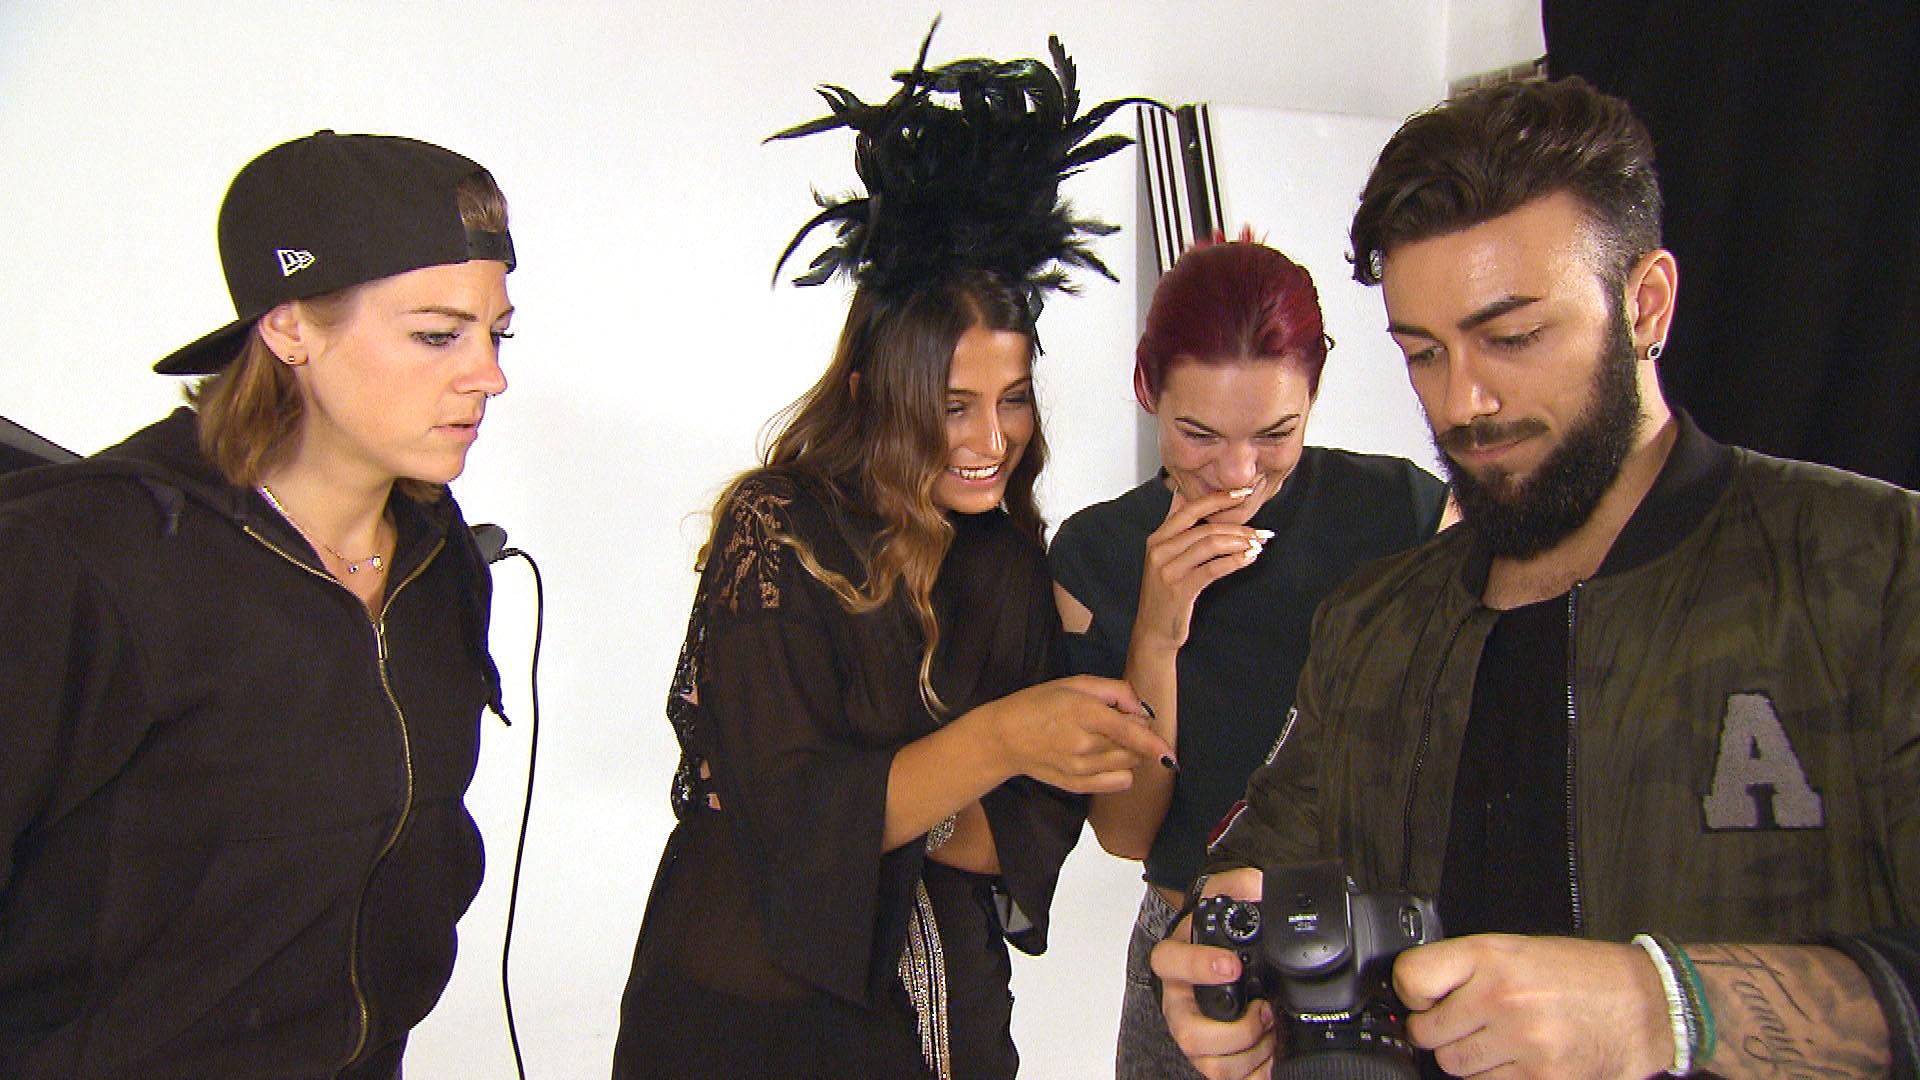 Alessia hat heute ihr lang ersehntes Fotoshooting. Foto v.li.: Alina, Alessia, Jessica, Fotograf (Quelle: RTL 2)